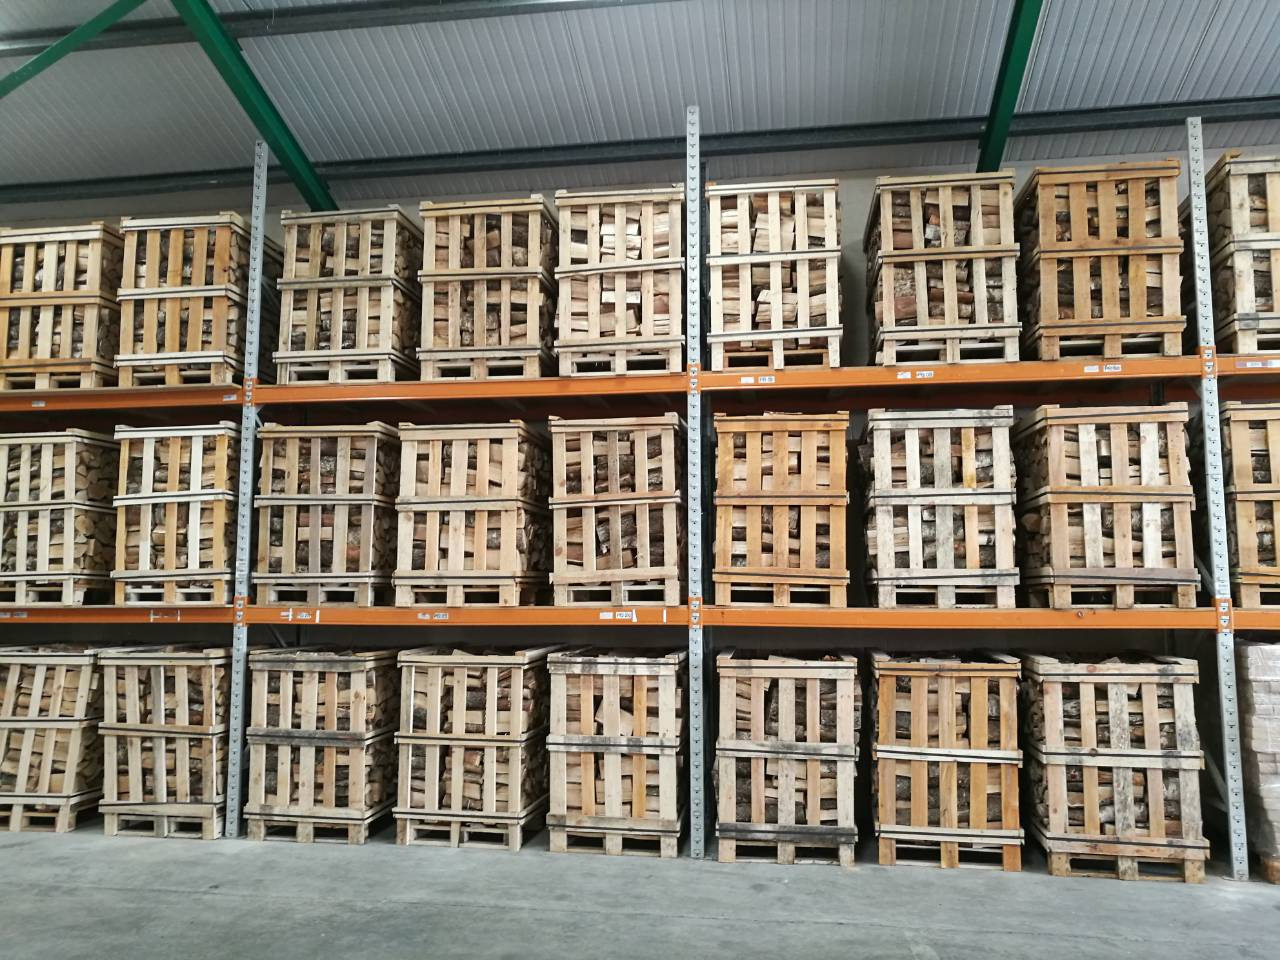 Firewood crates